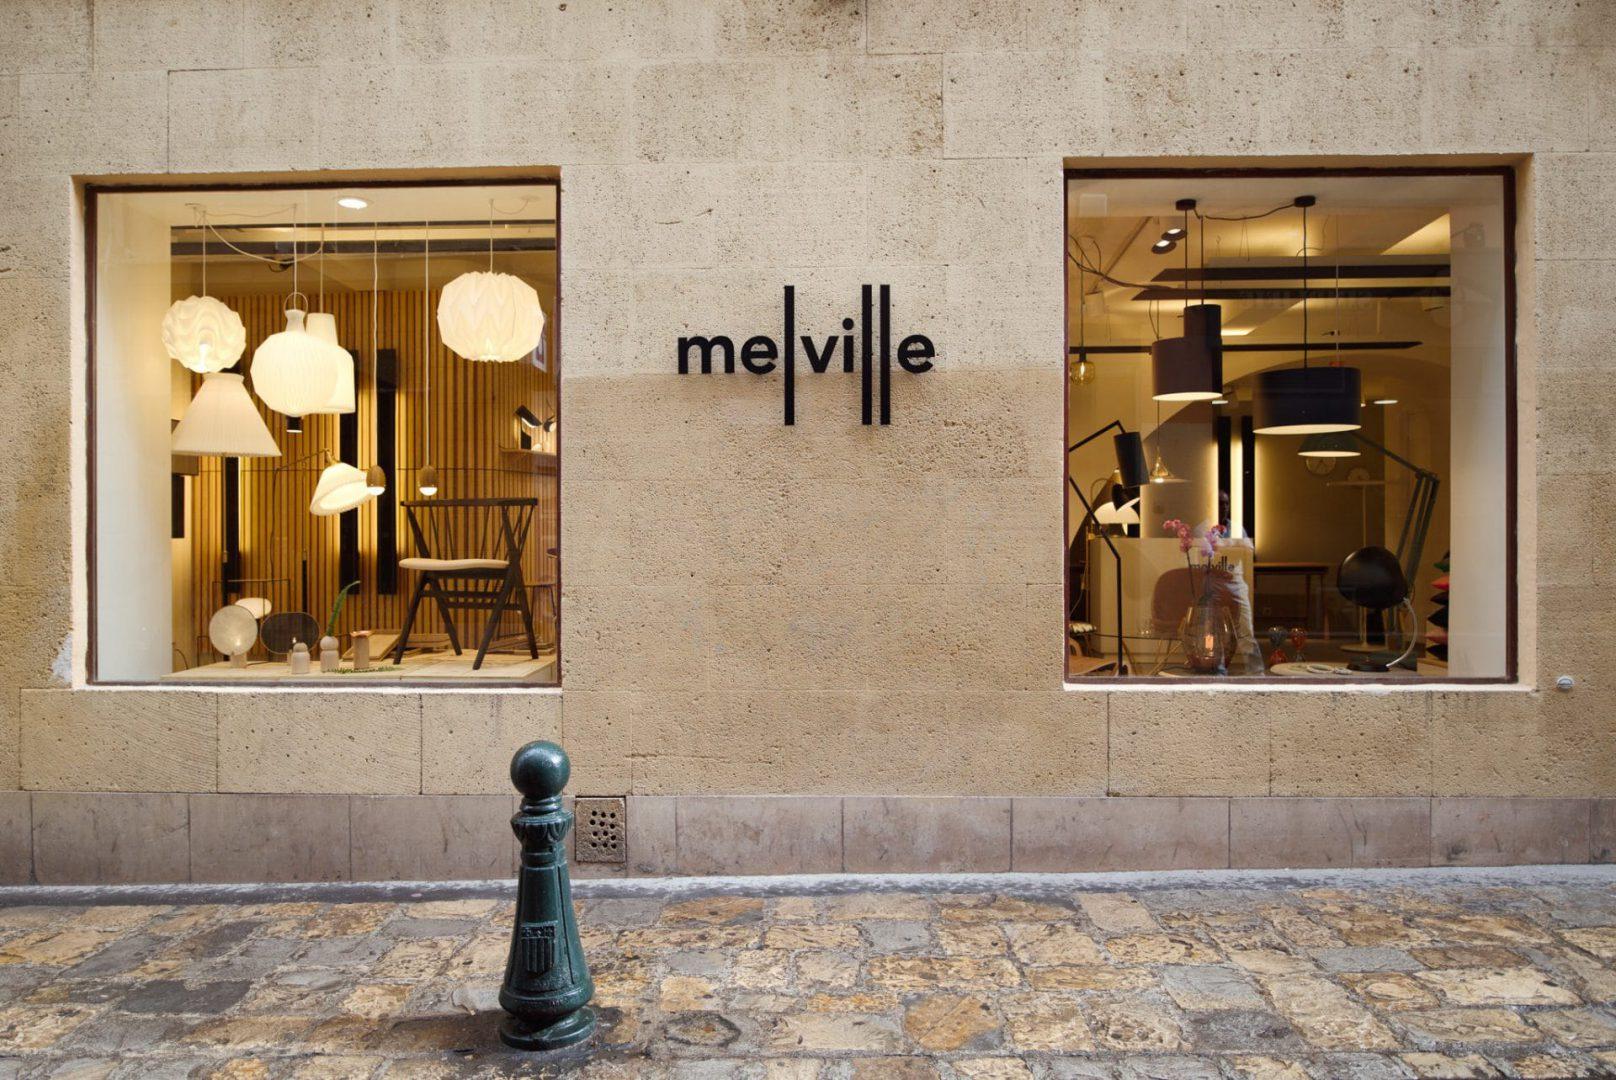 melville design - Aix en Provence